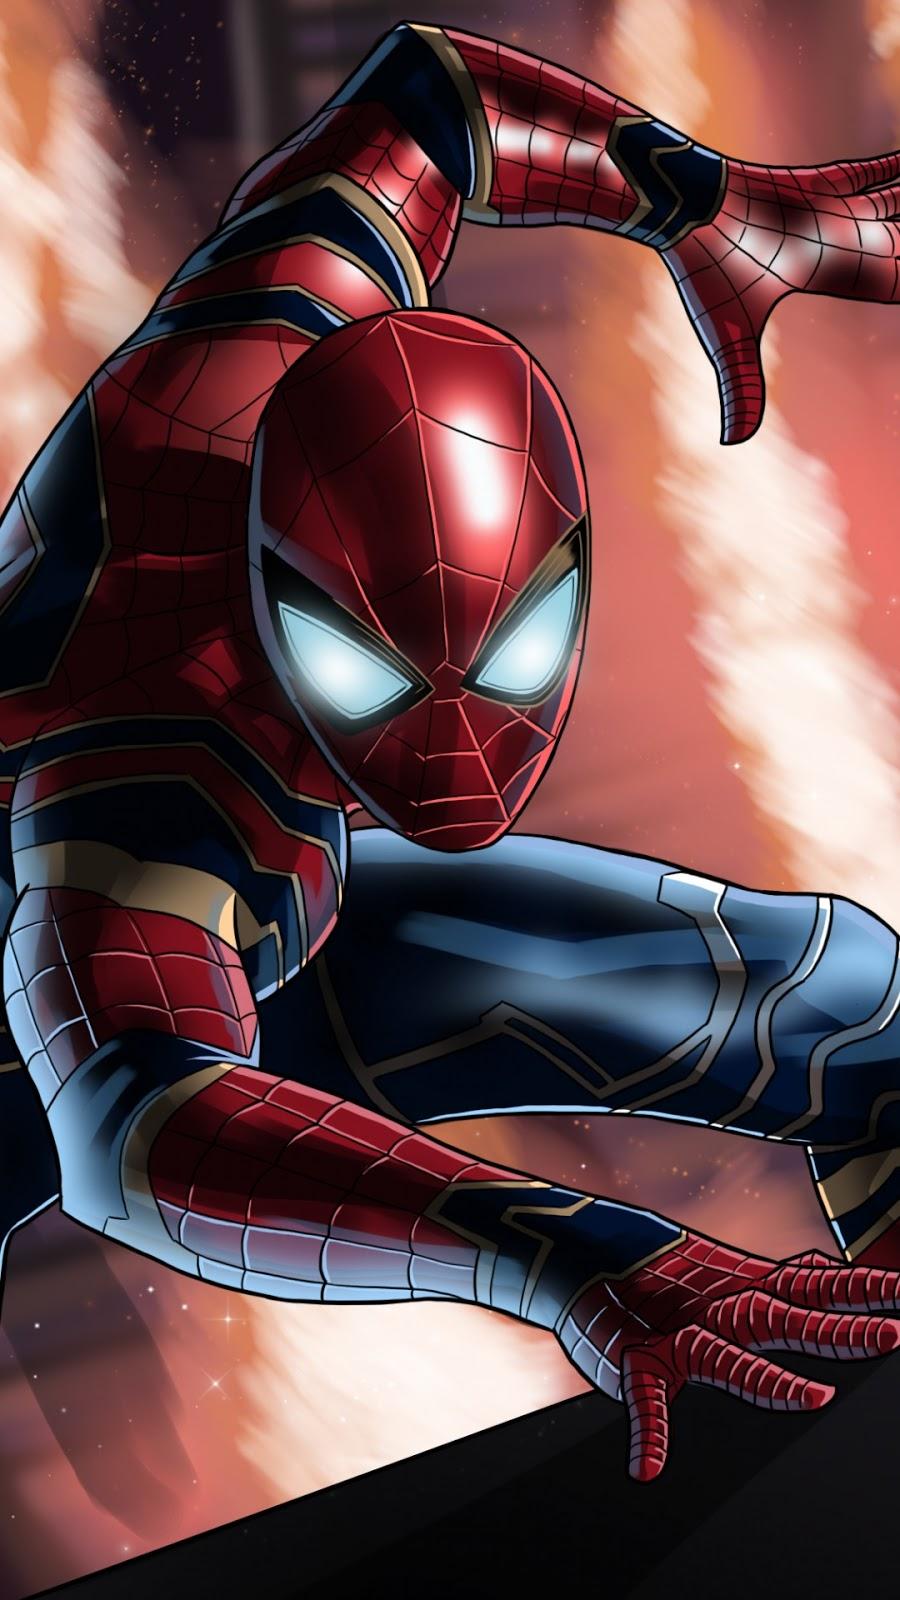 Papel de parede grátis Vingadores: Guerra Infinita Aranha de Ferro para PC, Notebook, iPhone, Android e Tablet.